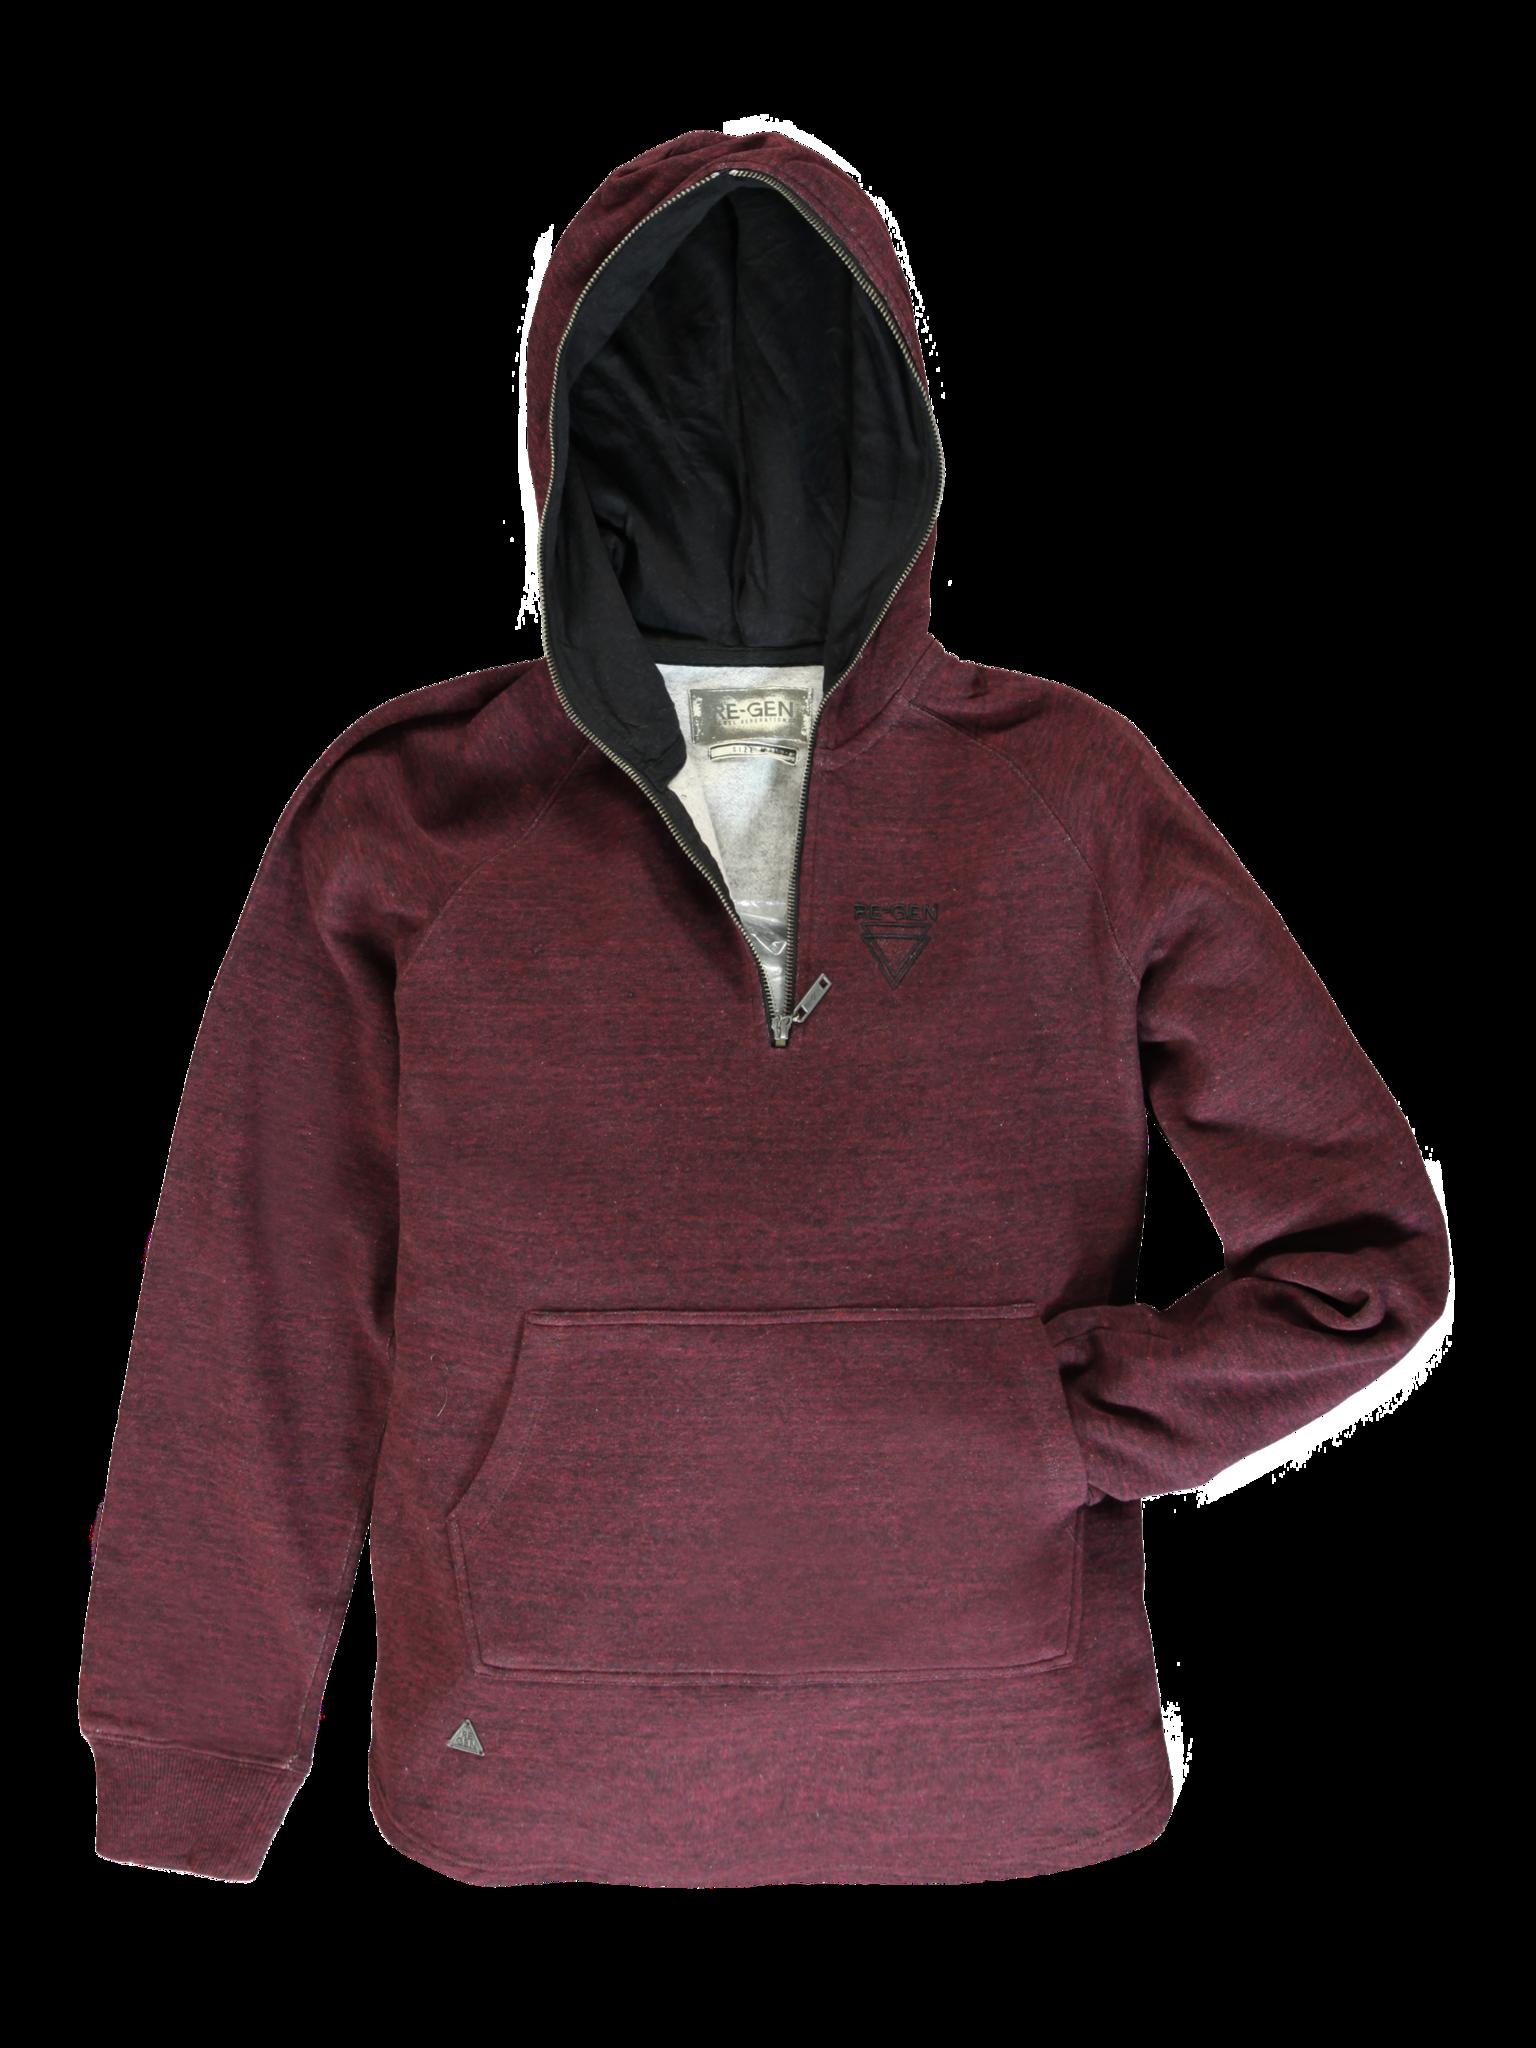 All Brands | Winterproducts Men | Sweatshirt | 20 pcs/box